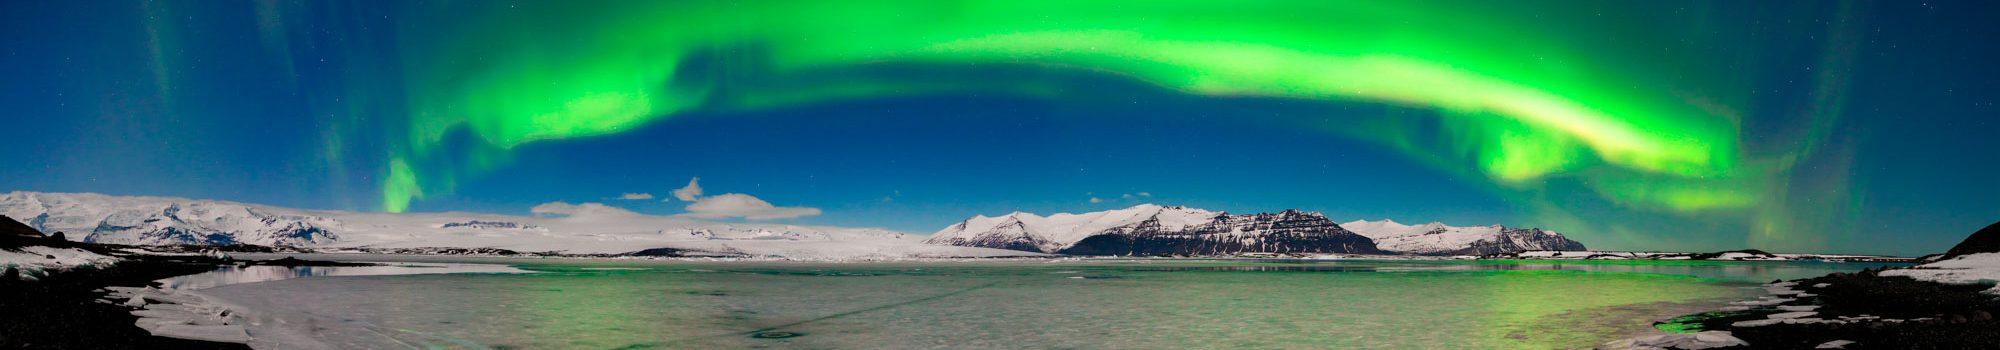 Aurora Borealis panoramic view